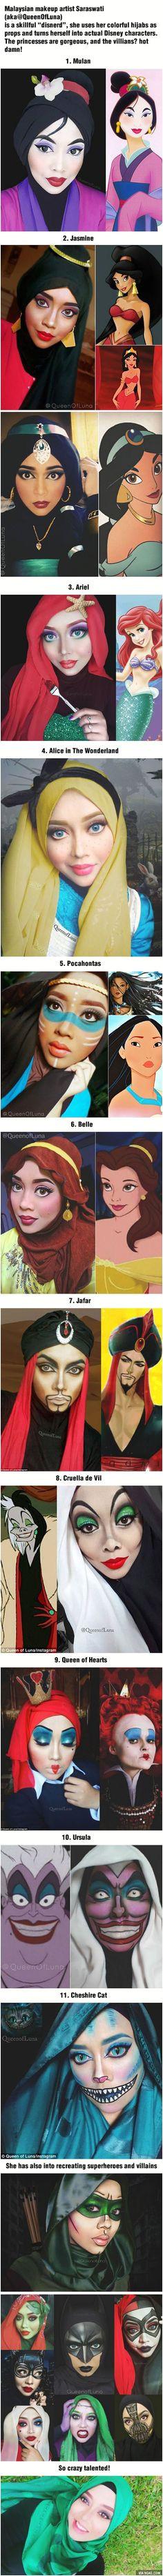 korean makeup artist displays skills with before and after photo by queenofluna eye makeup